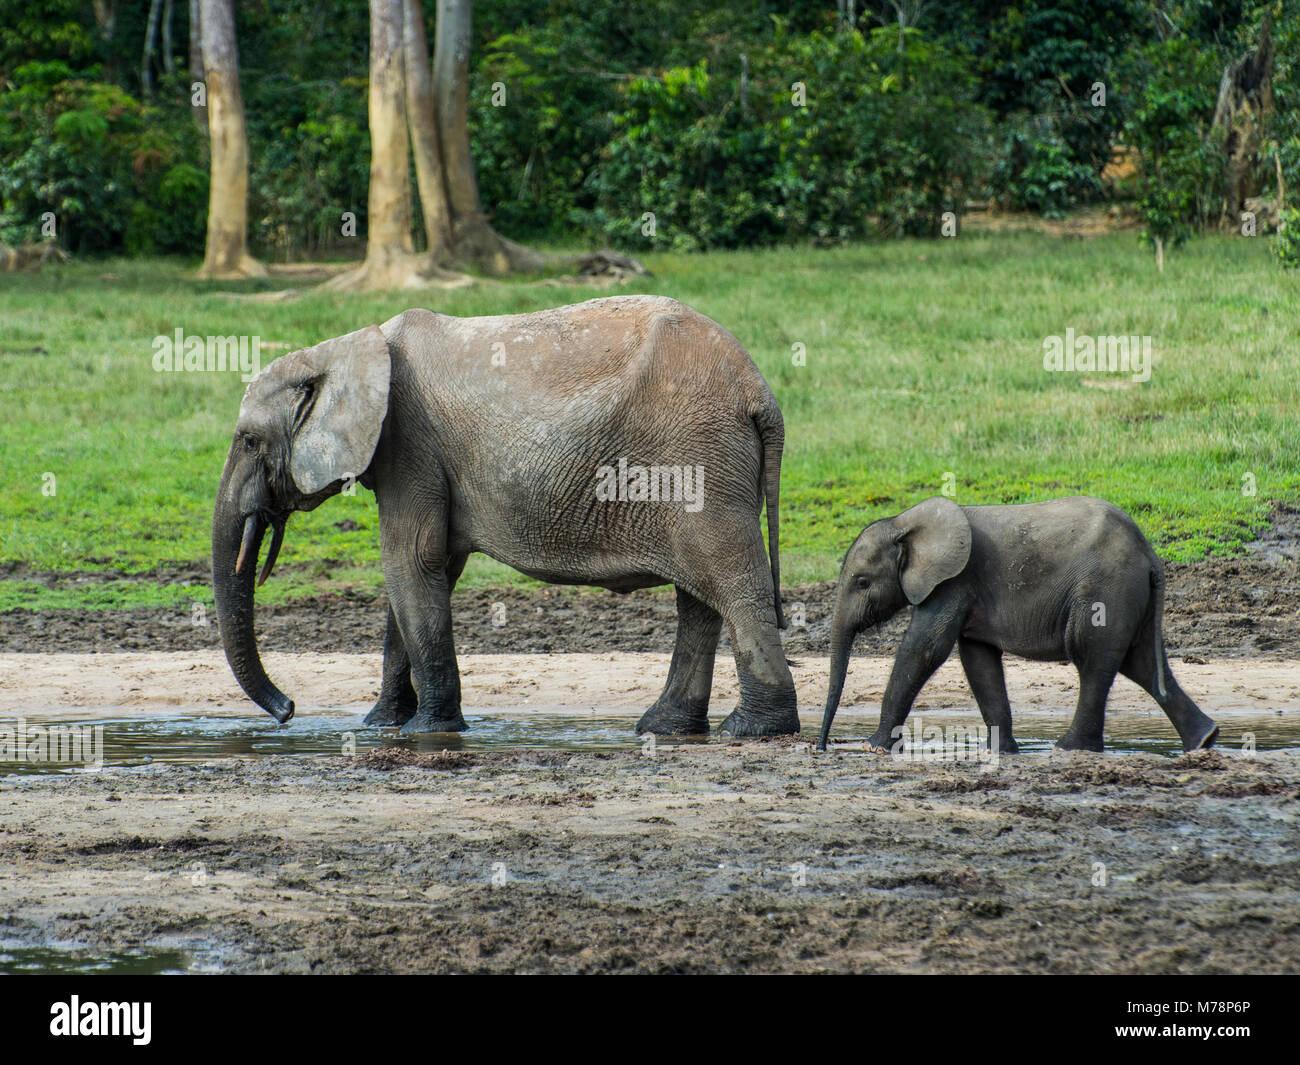 Young baby central african republic stock photos young for Designhotel elephant prague 1 czech republic